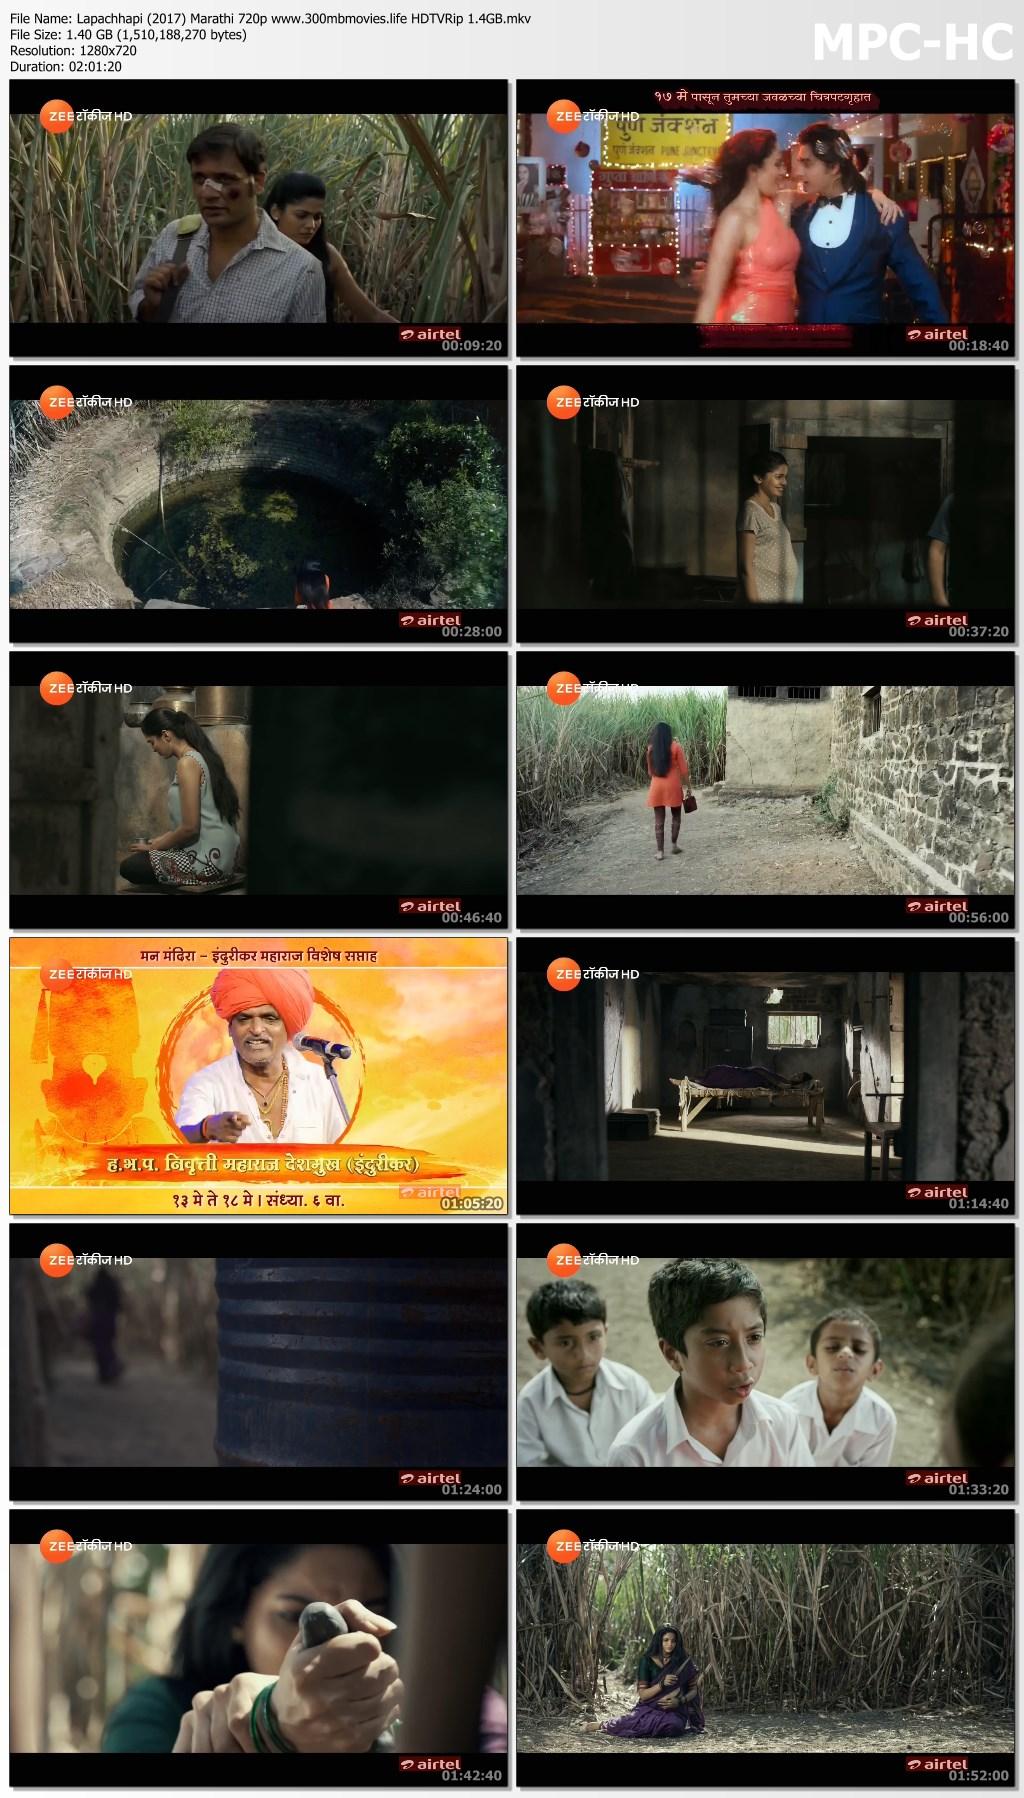 Lapachhapi (2017) Marathi Movie 720p HDTVRip 1 5GB Download